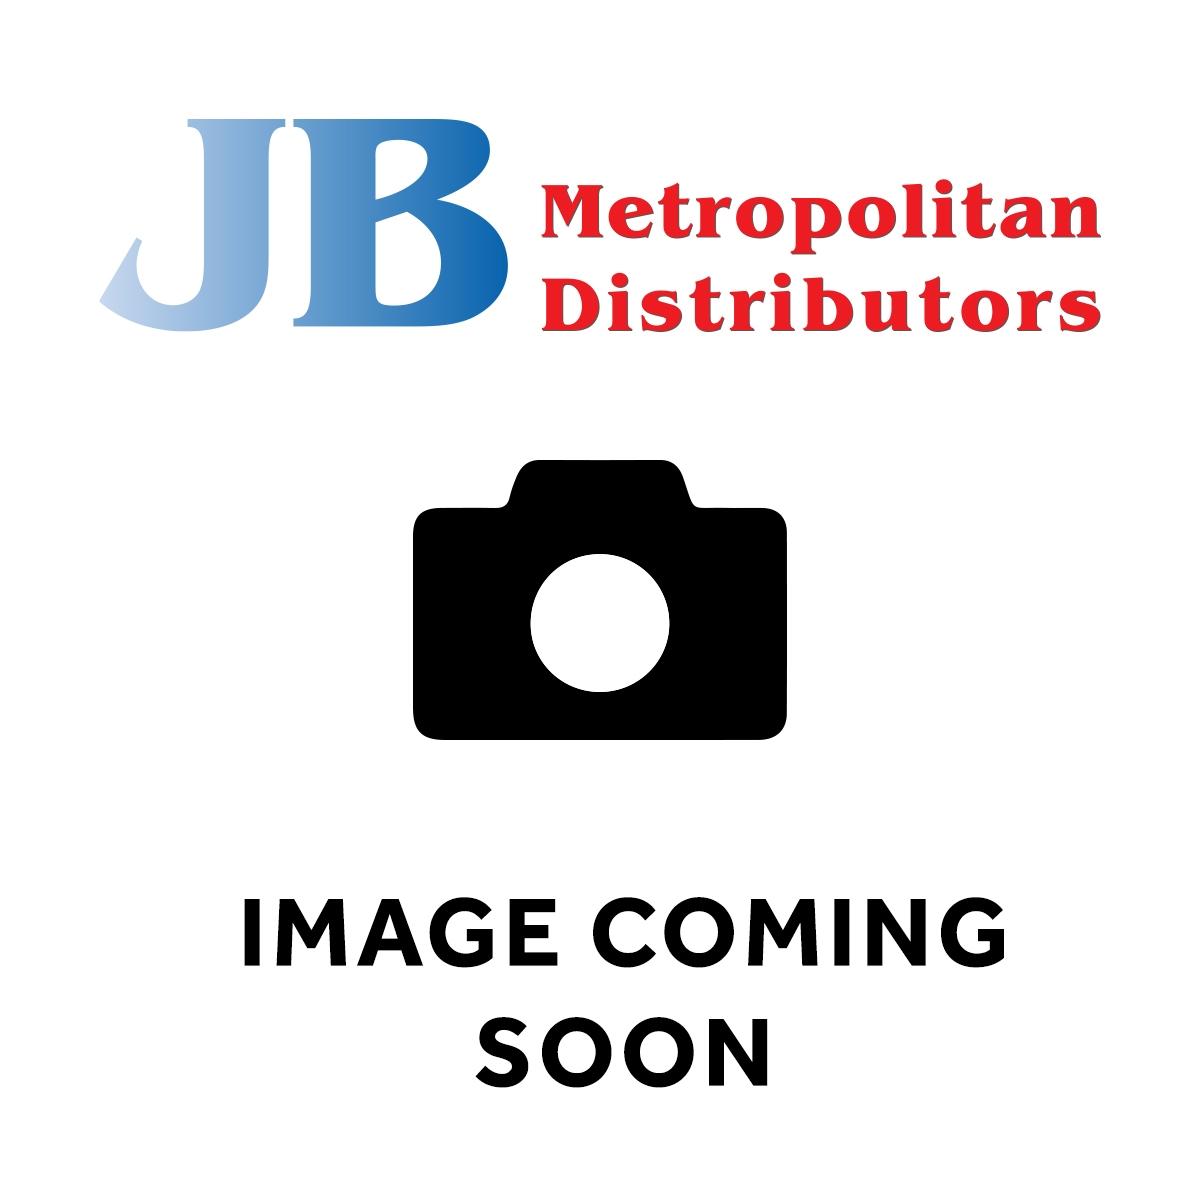 CARRIER BAG MEDIUM (200)